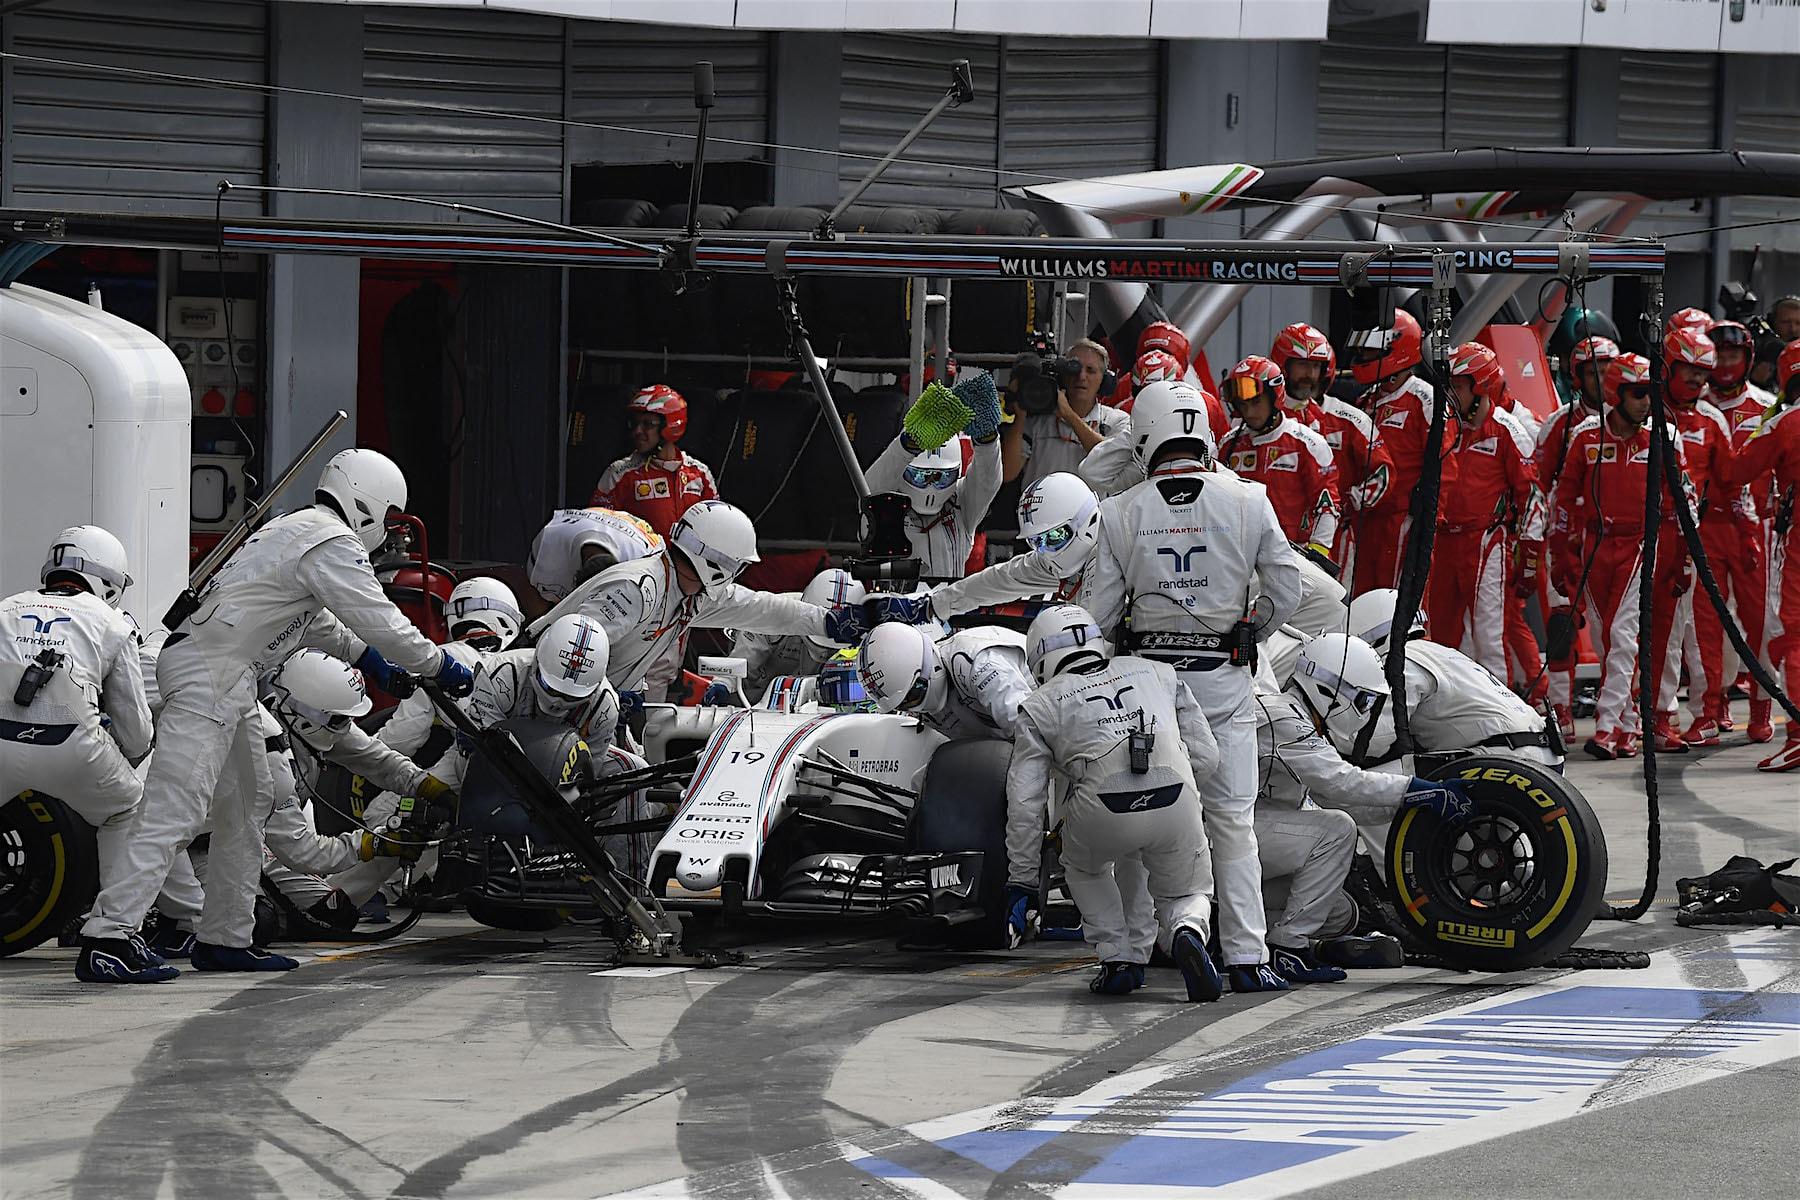 Salracing - Williams Martini Racing